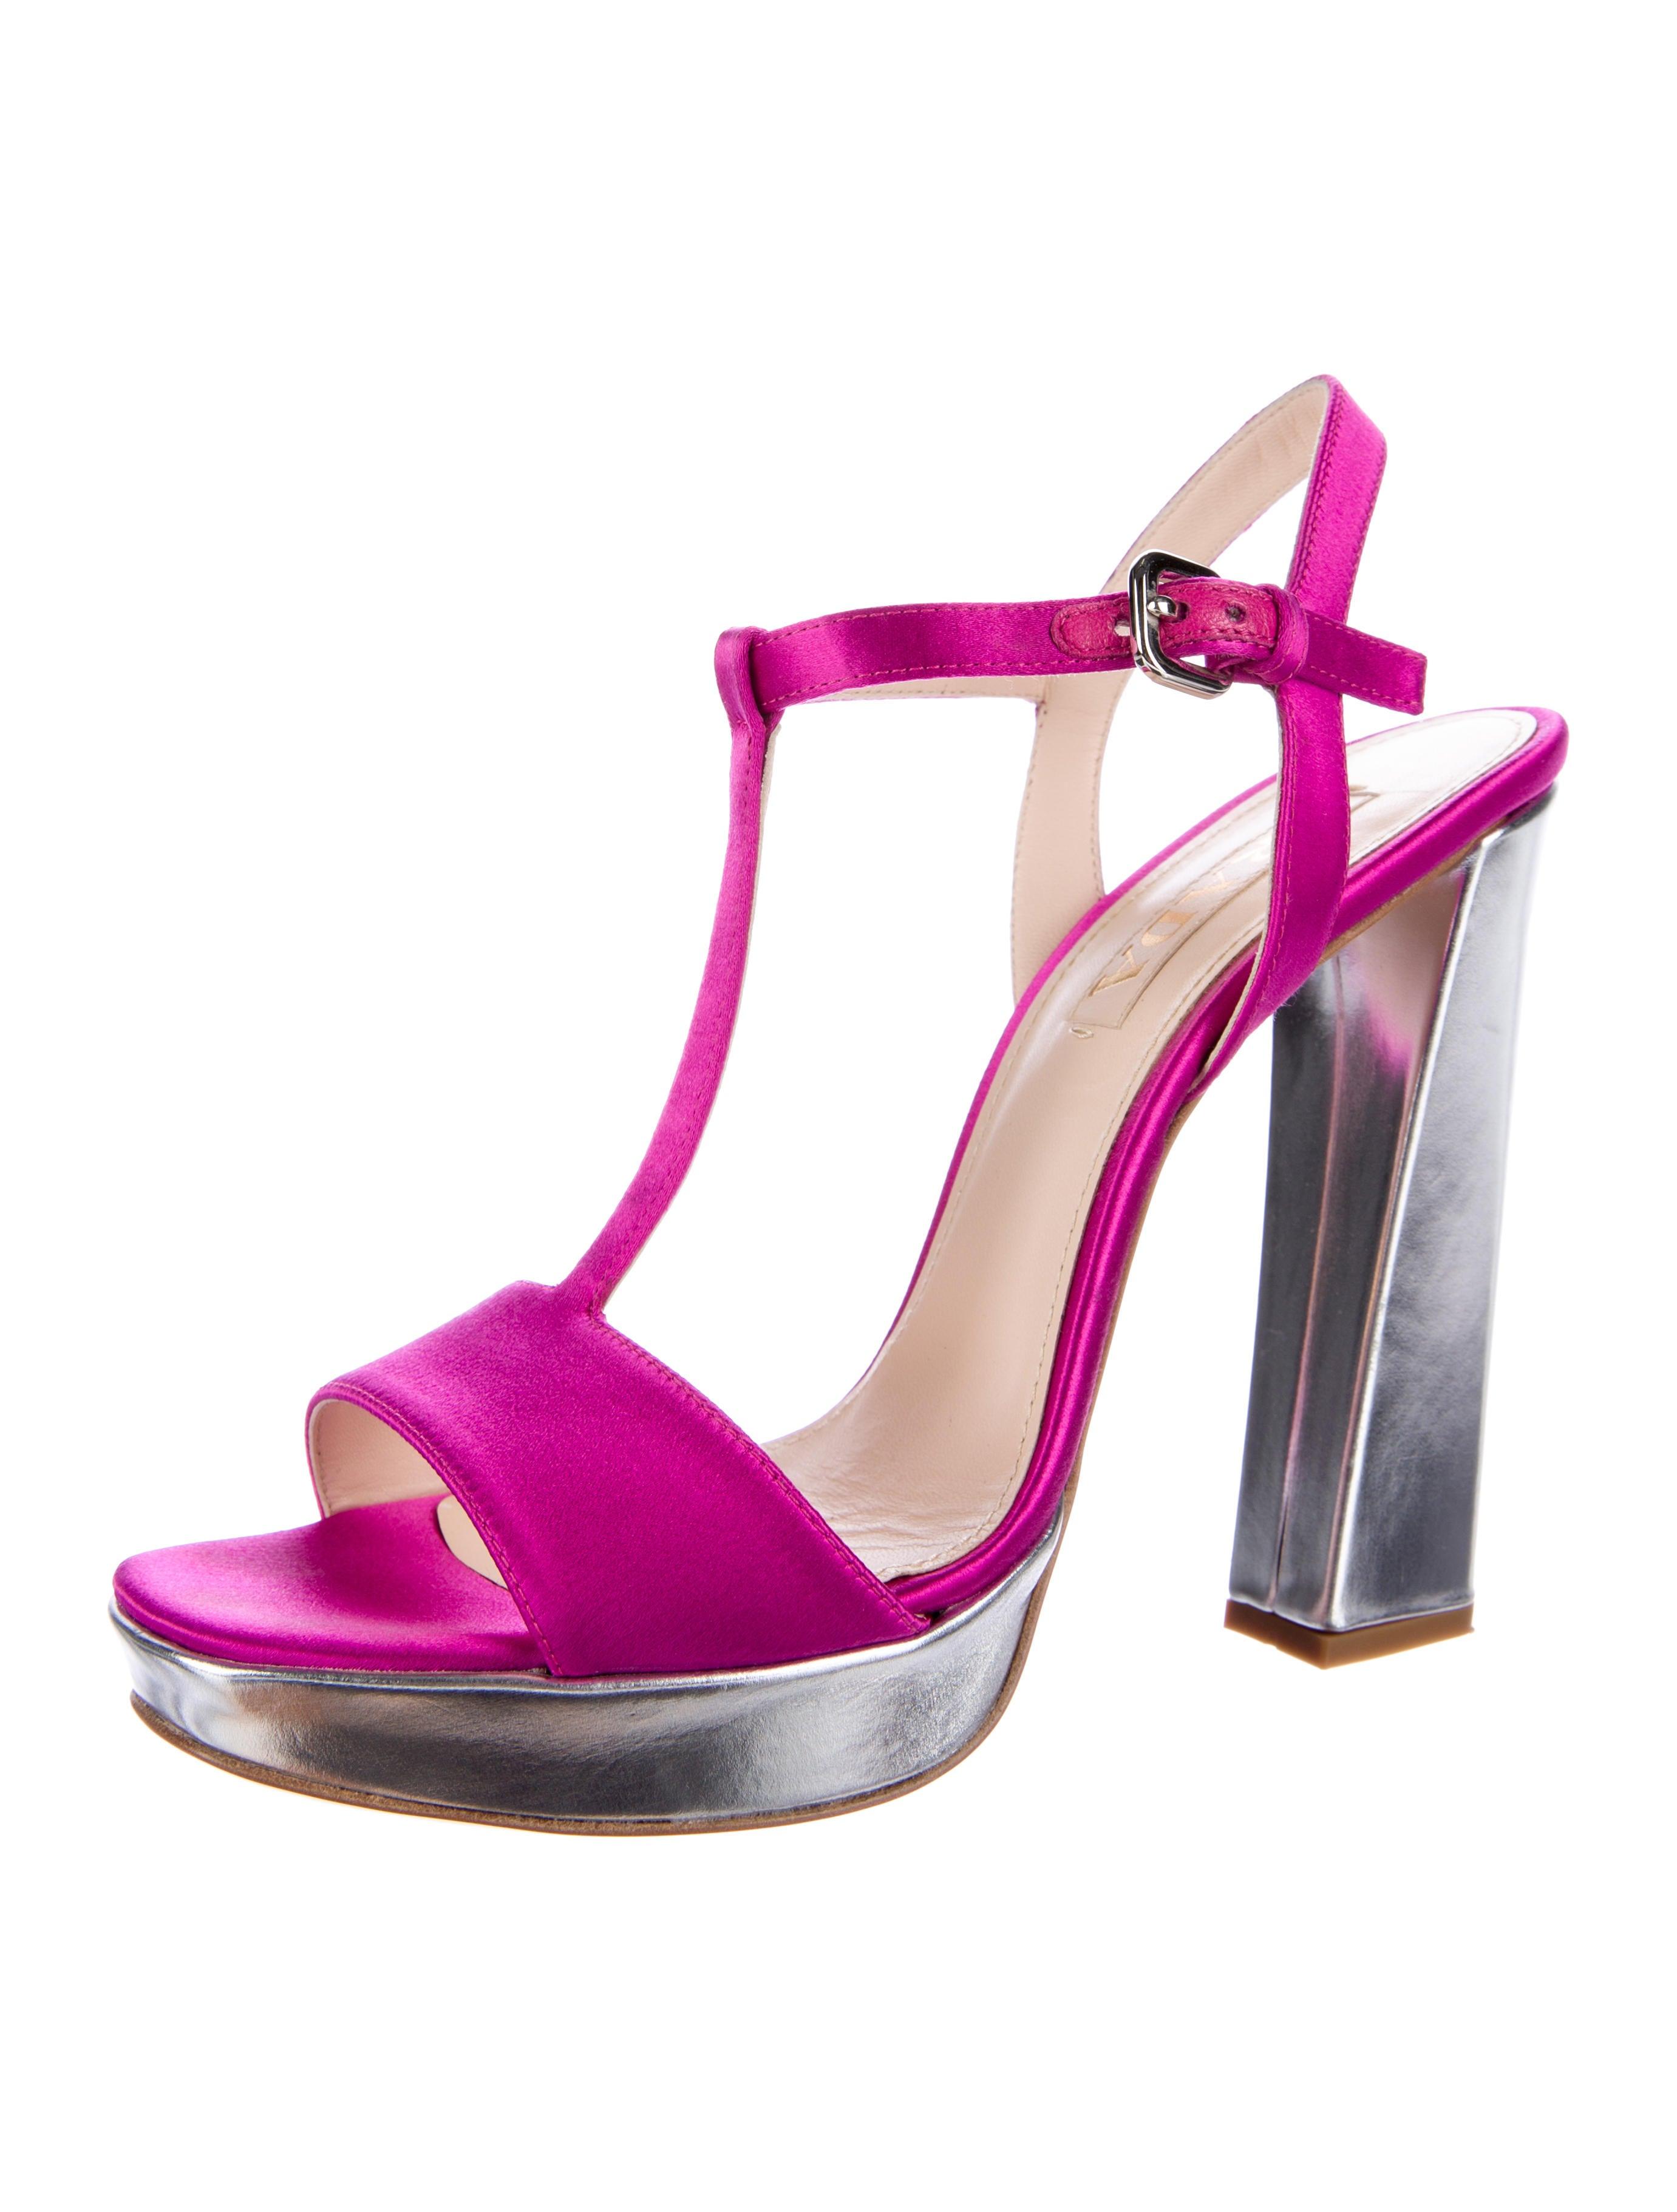 Perfect Prada Leather Platform Sandals  Shoes  PRA133111  The RealReal